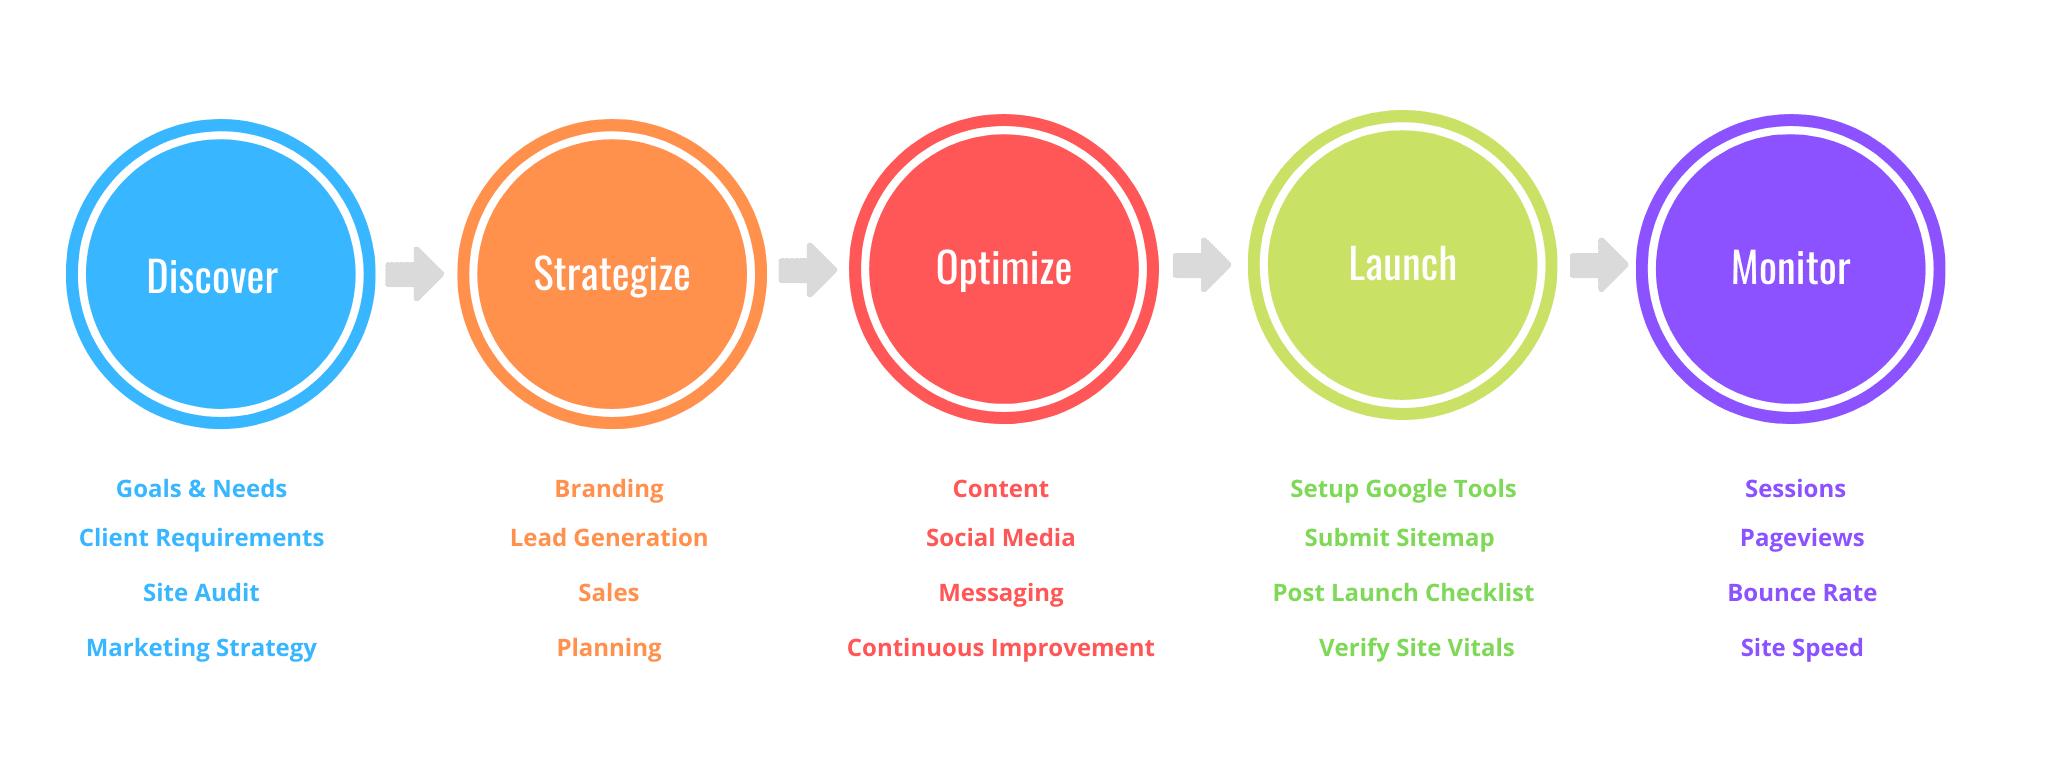 Digital Marketing Process Workflow